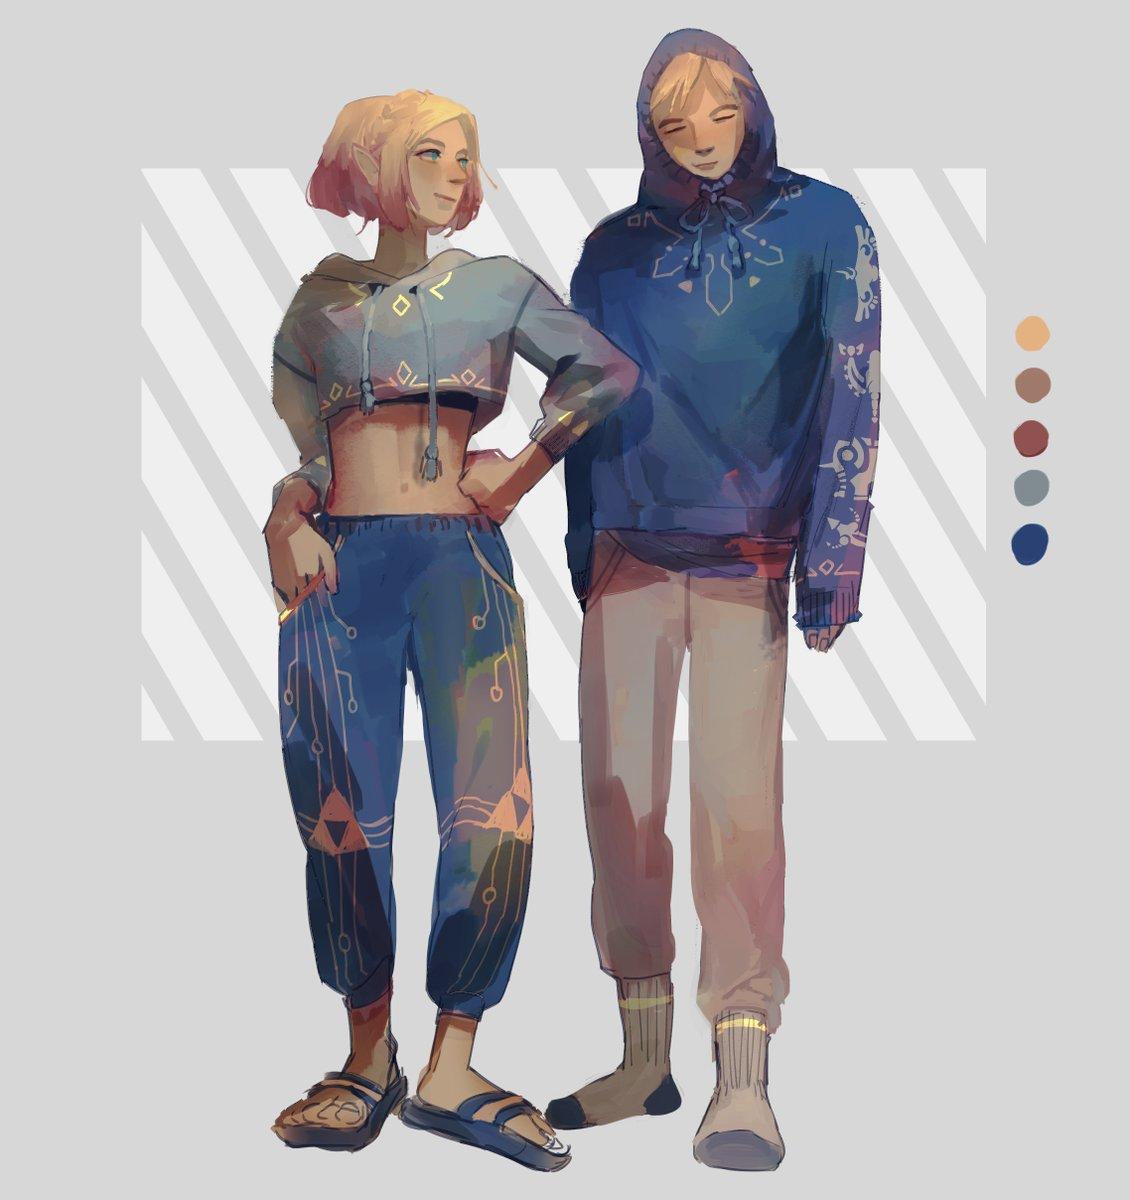 Link + Zelda + Quarantine outfits. Comfort first, fashion also first!! #BOTW #TheLegendofZelda #tloz #ootd #fashion how I love hoodie-egg link... '_>` pic.twitter.com/FuzP8WiDiZ